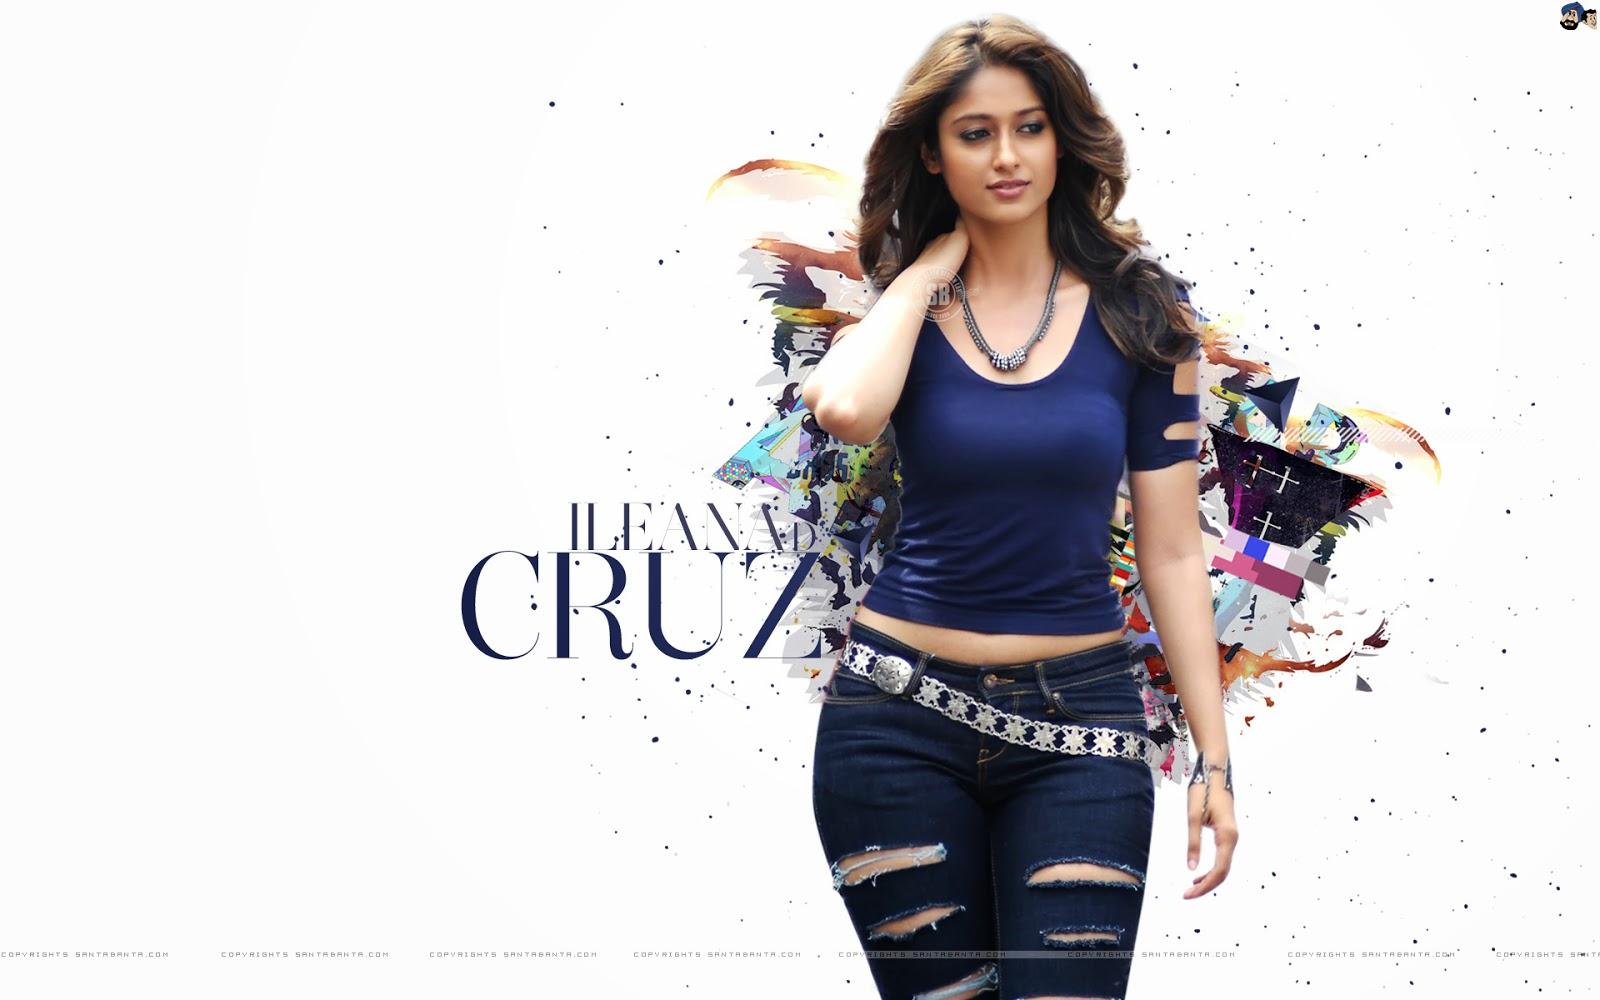 Ileana D Cruz Full Hd Images: Ileana Hot Hd Wallpapers Free Download